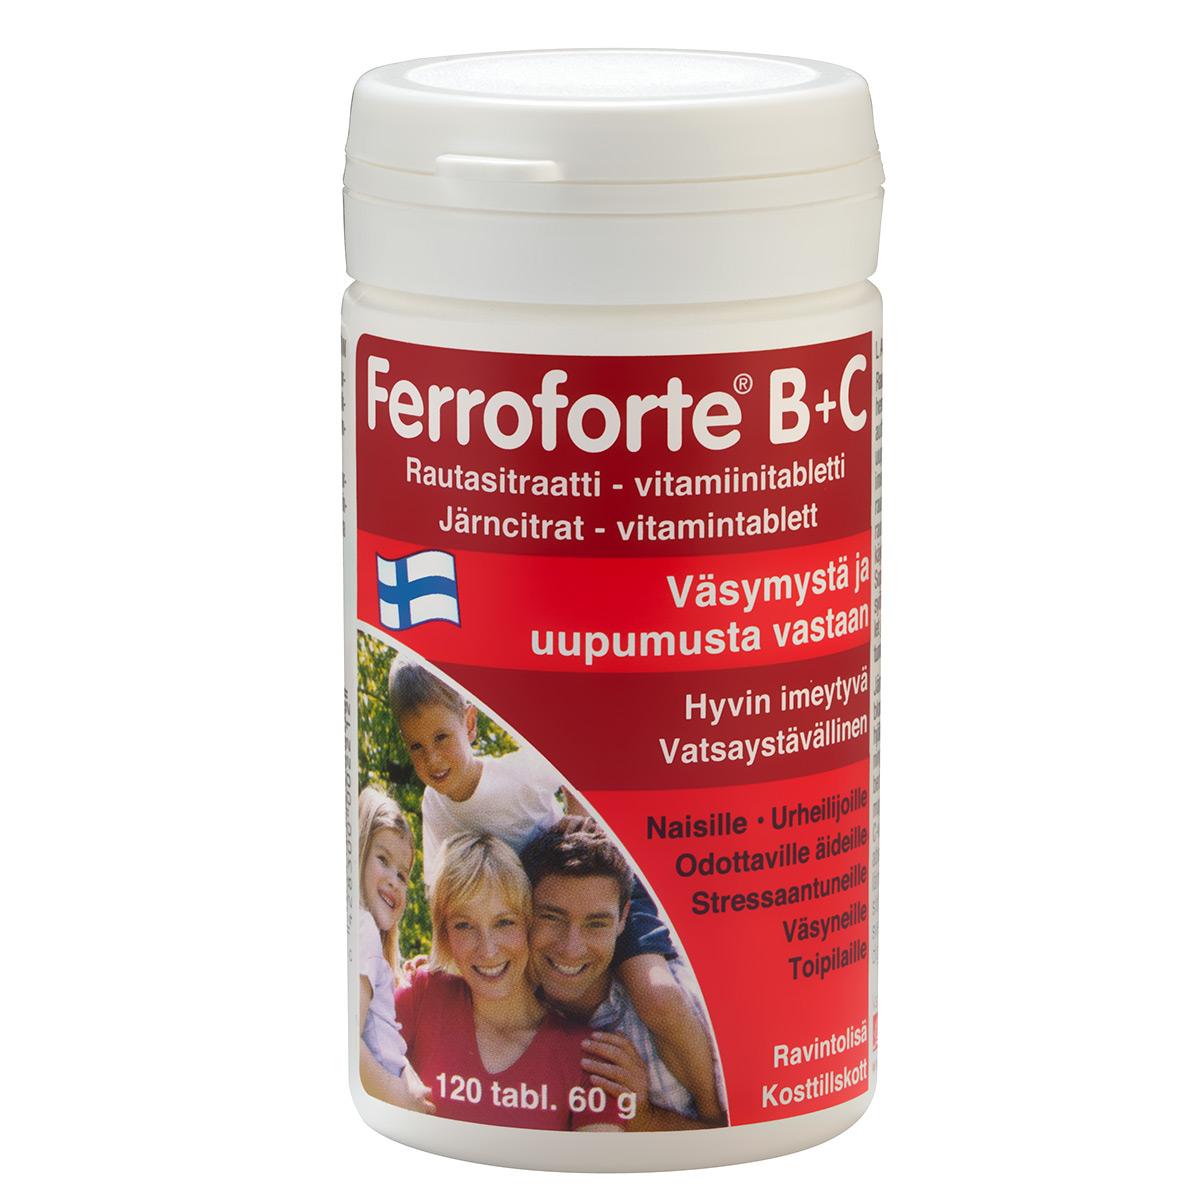 Ferroforte B+C Kokemuksia